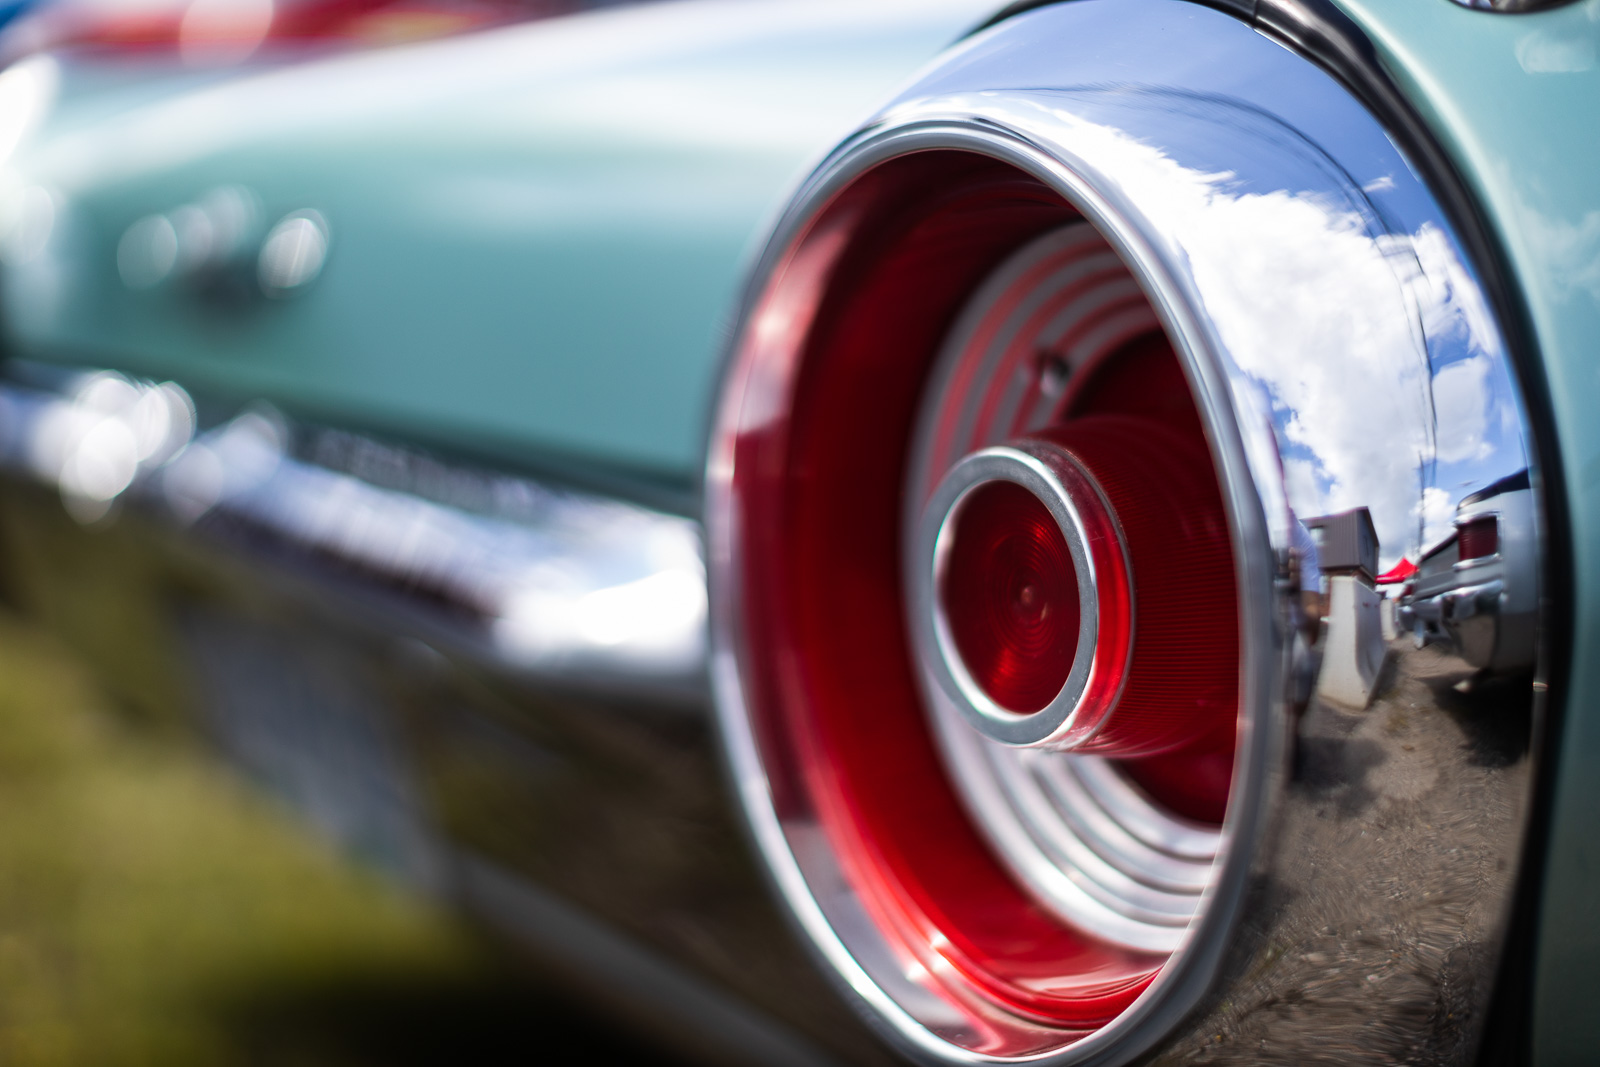 fat-guys-car-show-blog-61.jpg